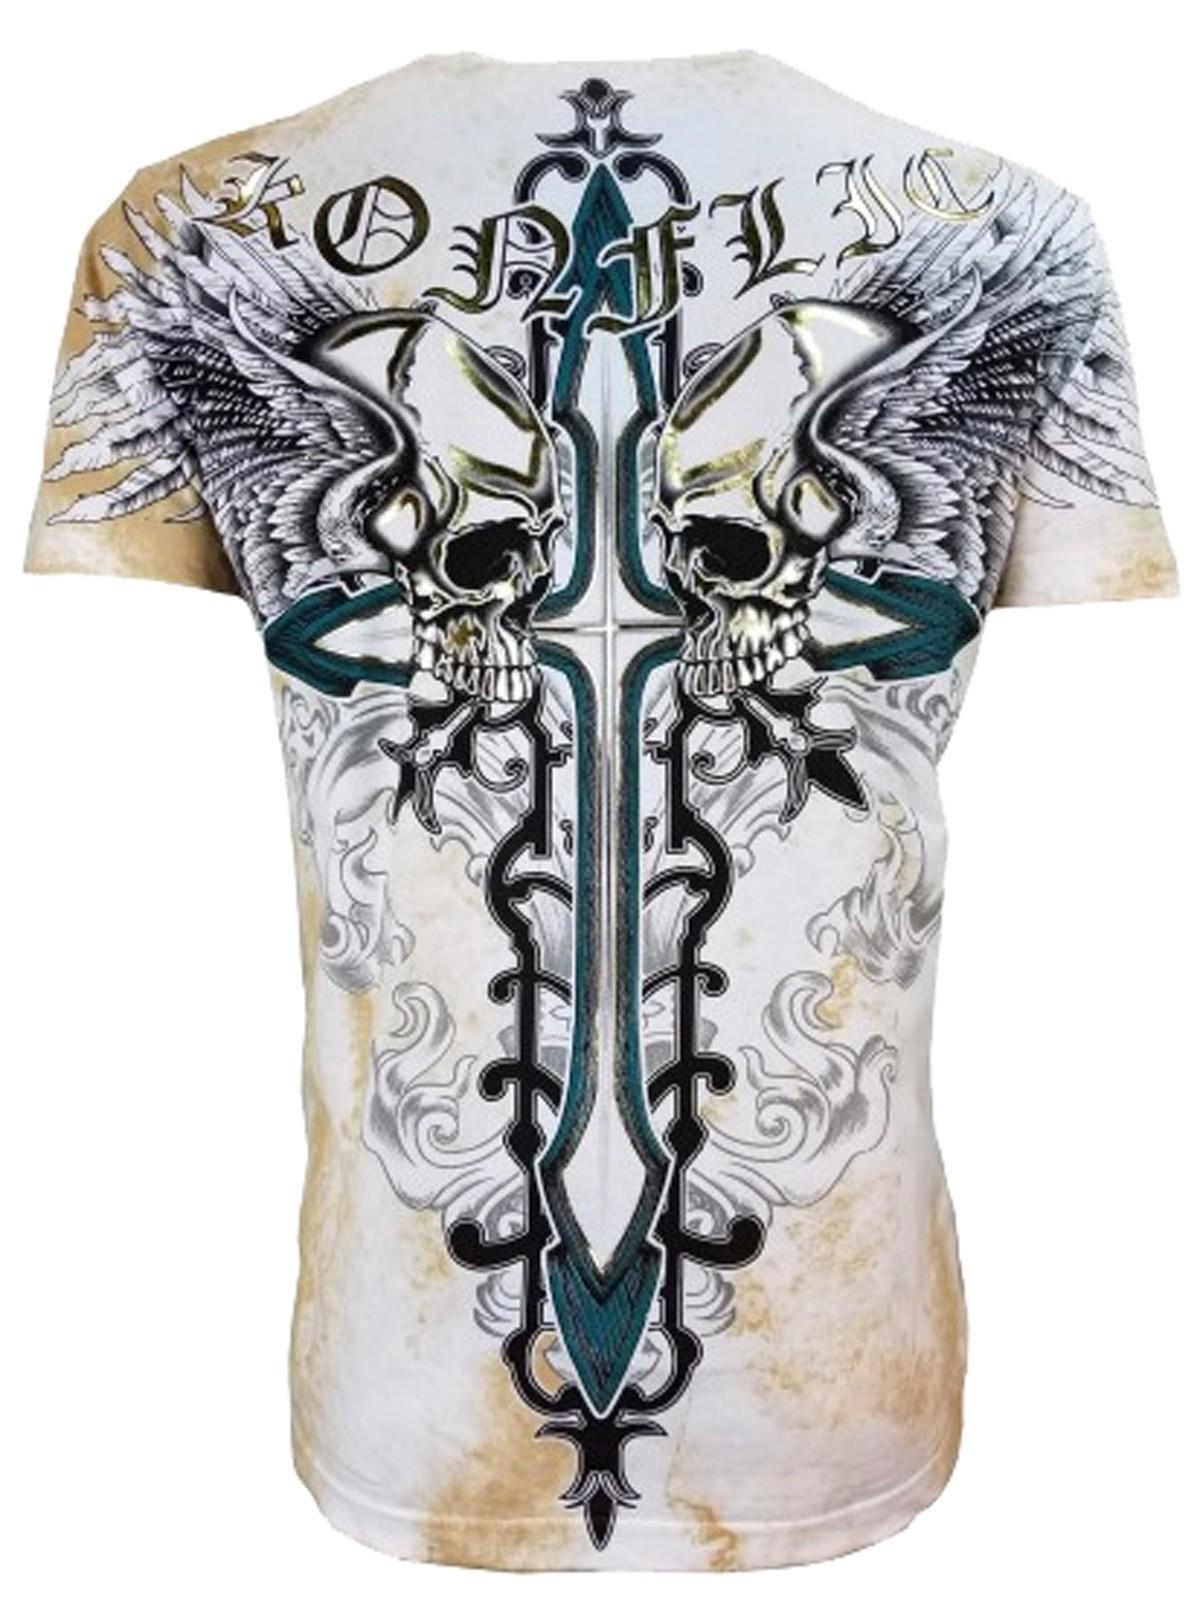 Konflic Clothing - Winged Skulls T-Shirt